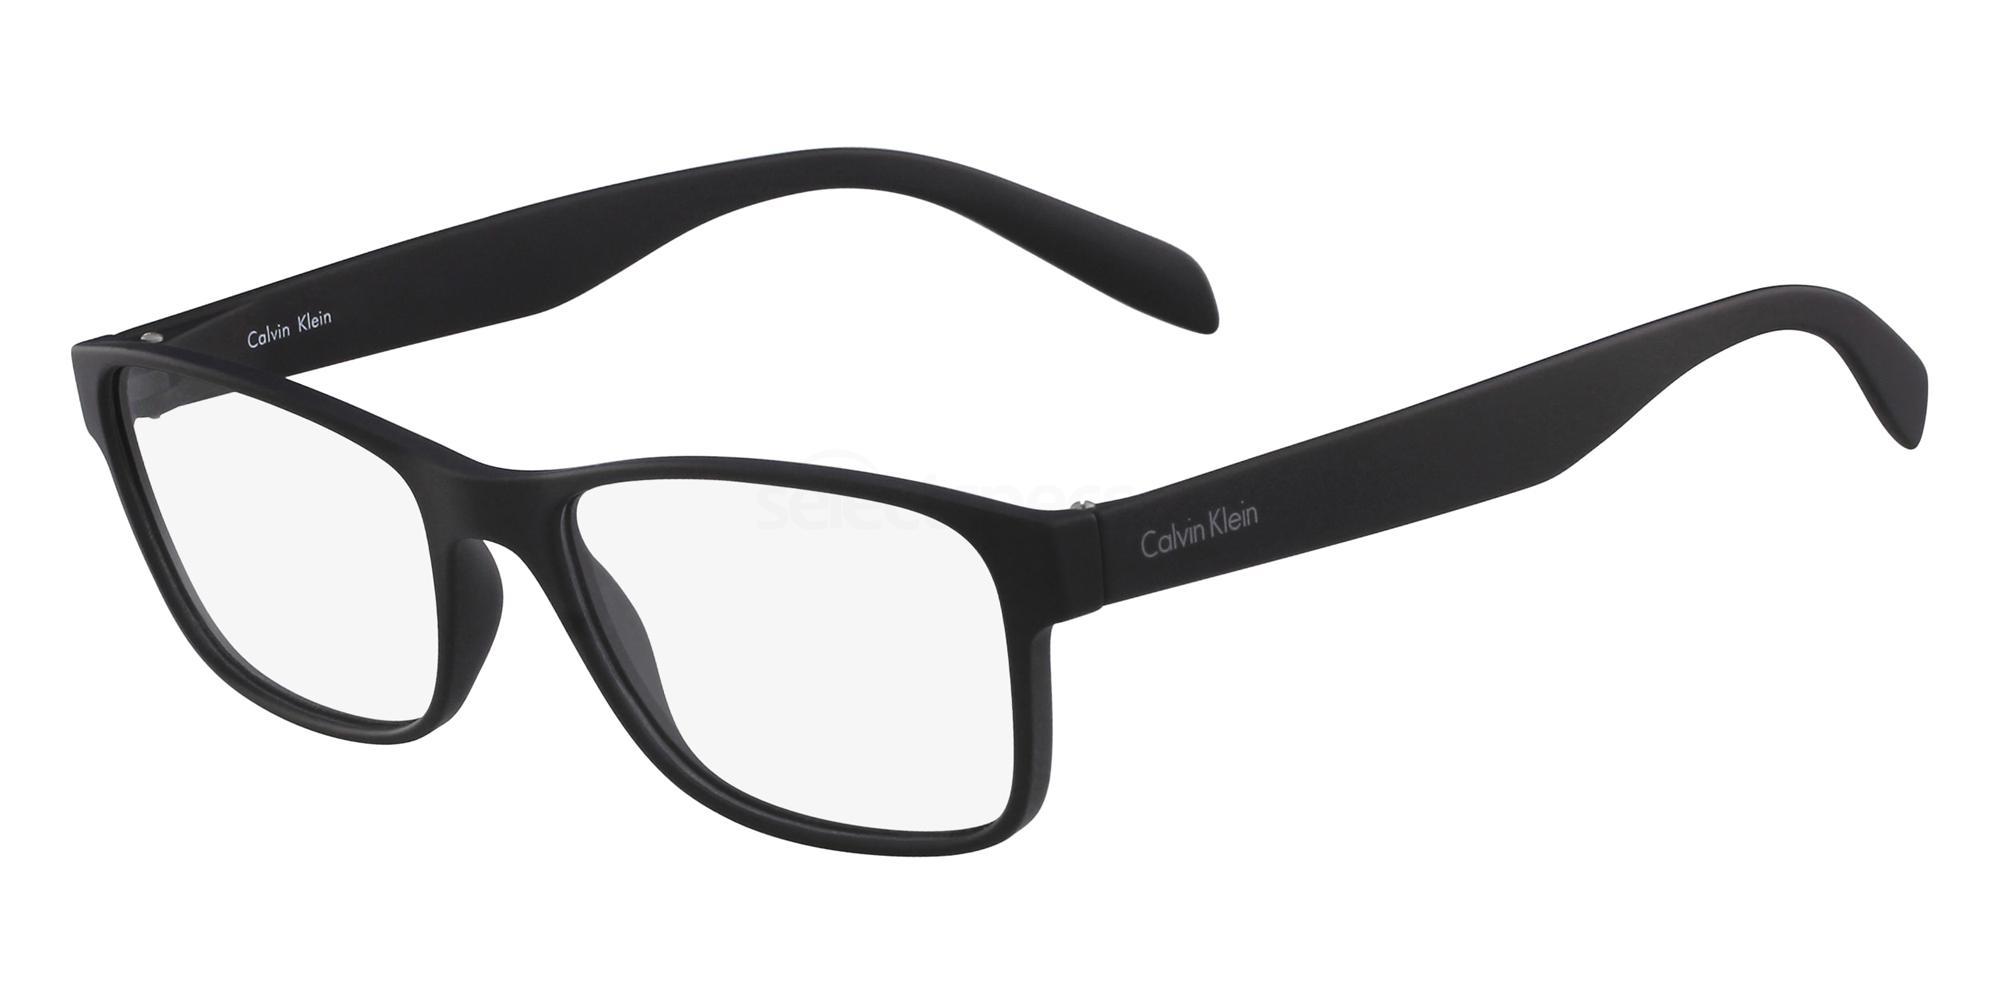 001 CK5970 Glasses, Calvin Klein